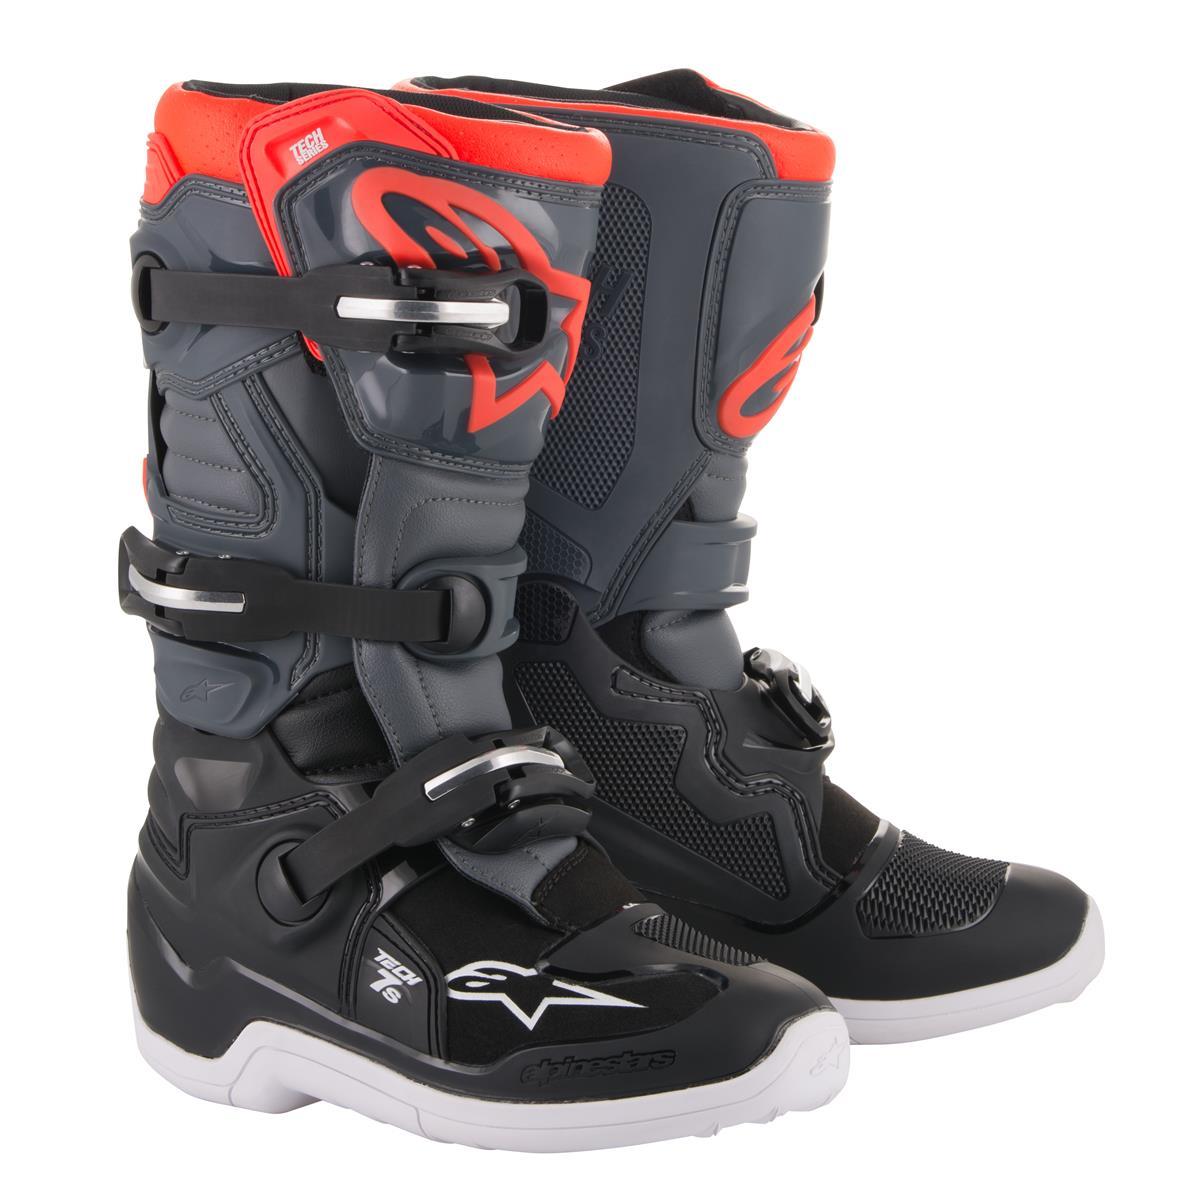 Alpinestars Kids Motocross-Stiefel Tech 7S Schwarz/Dunkelgrau/Rot Fluo